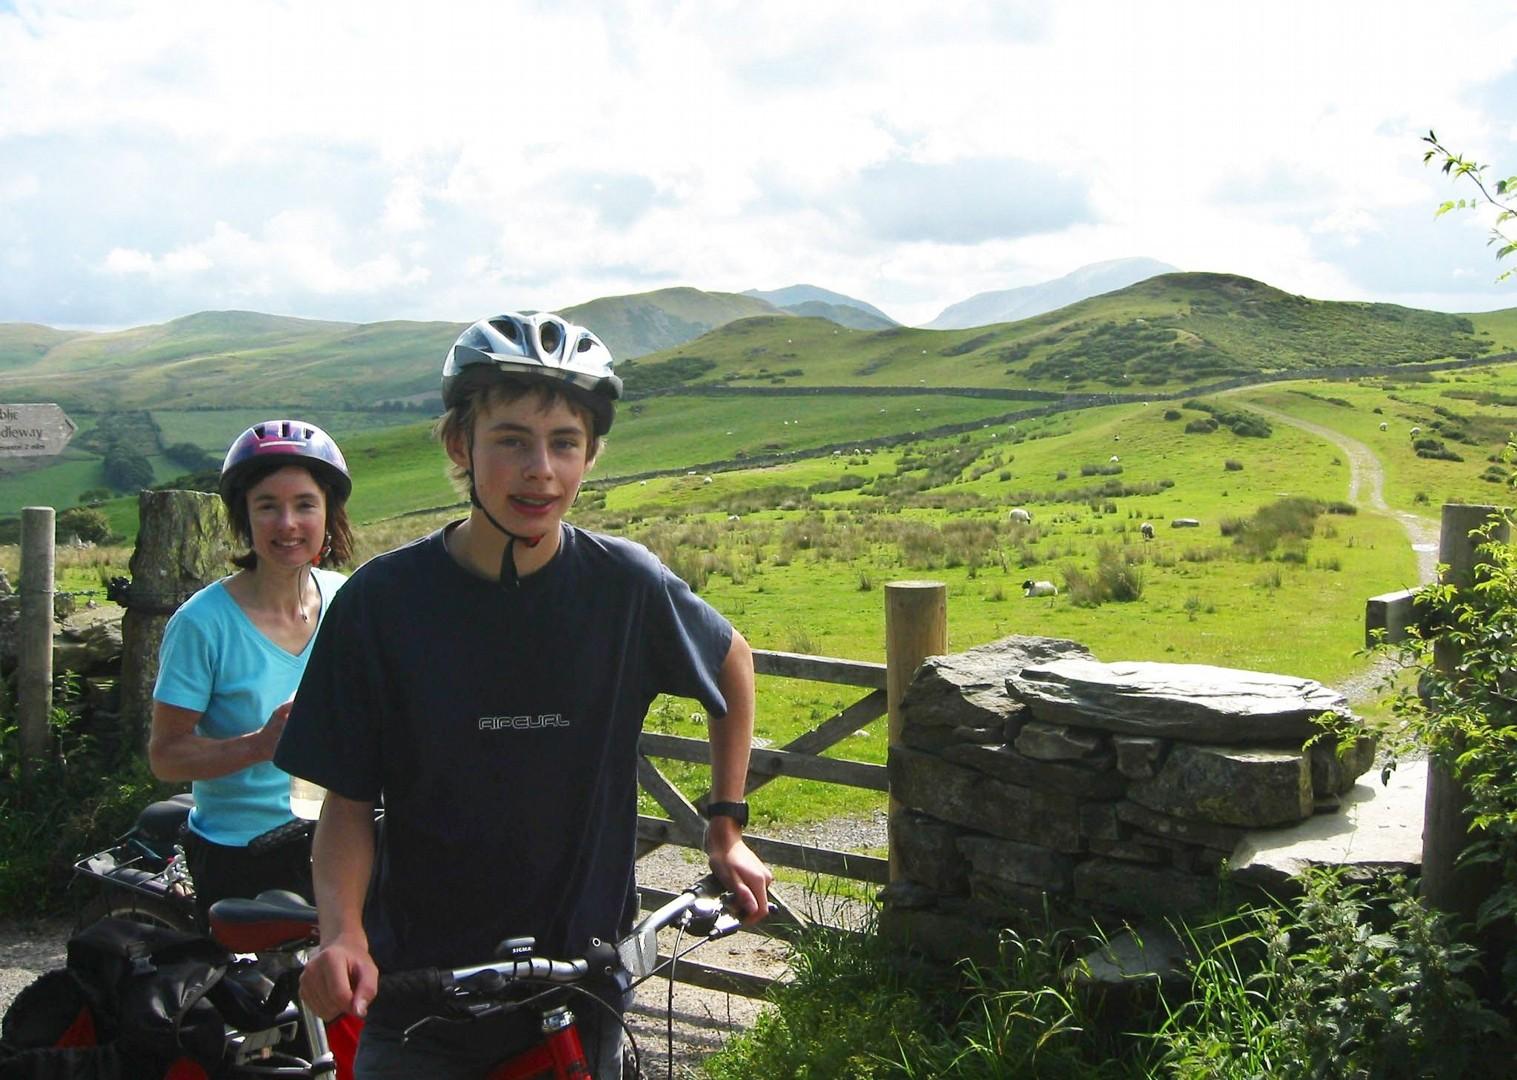 family-guided-cycling-holiday-uk-lake-district-bike-skills.jpg - UK - Lake District - Guided Family Bike Skills - Family Cycling